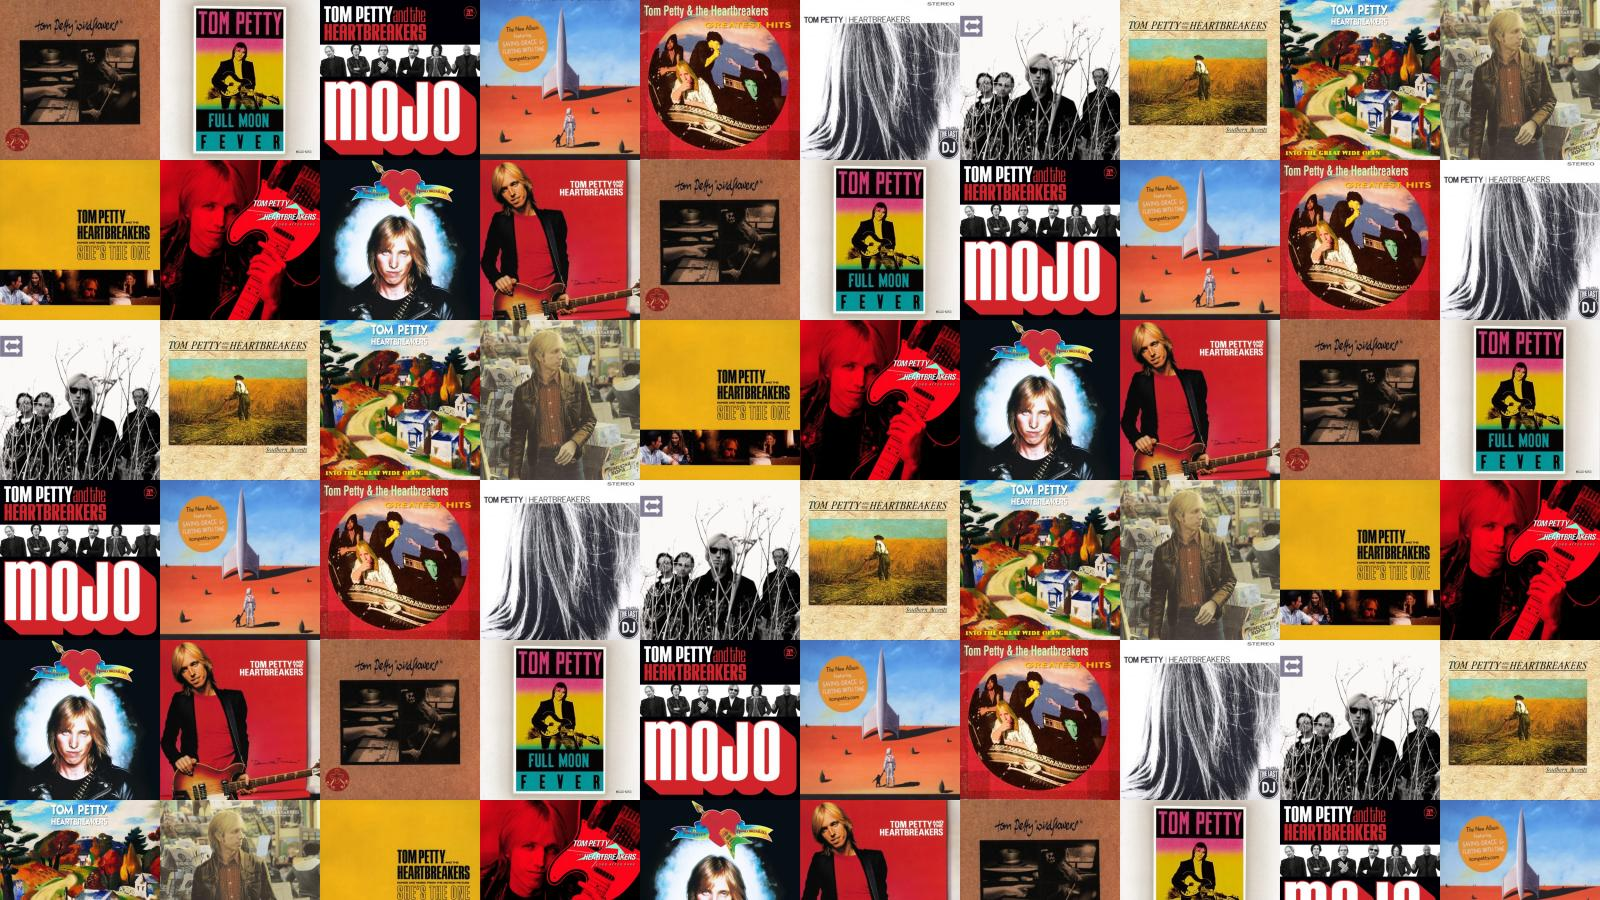 Tom Petty Wildflowers Tom Petty Full Moon Wallpaper 1600x900